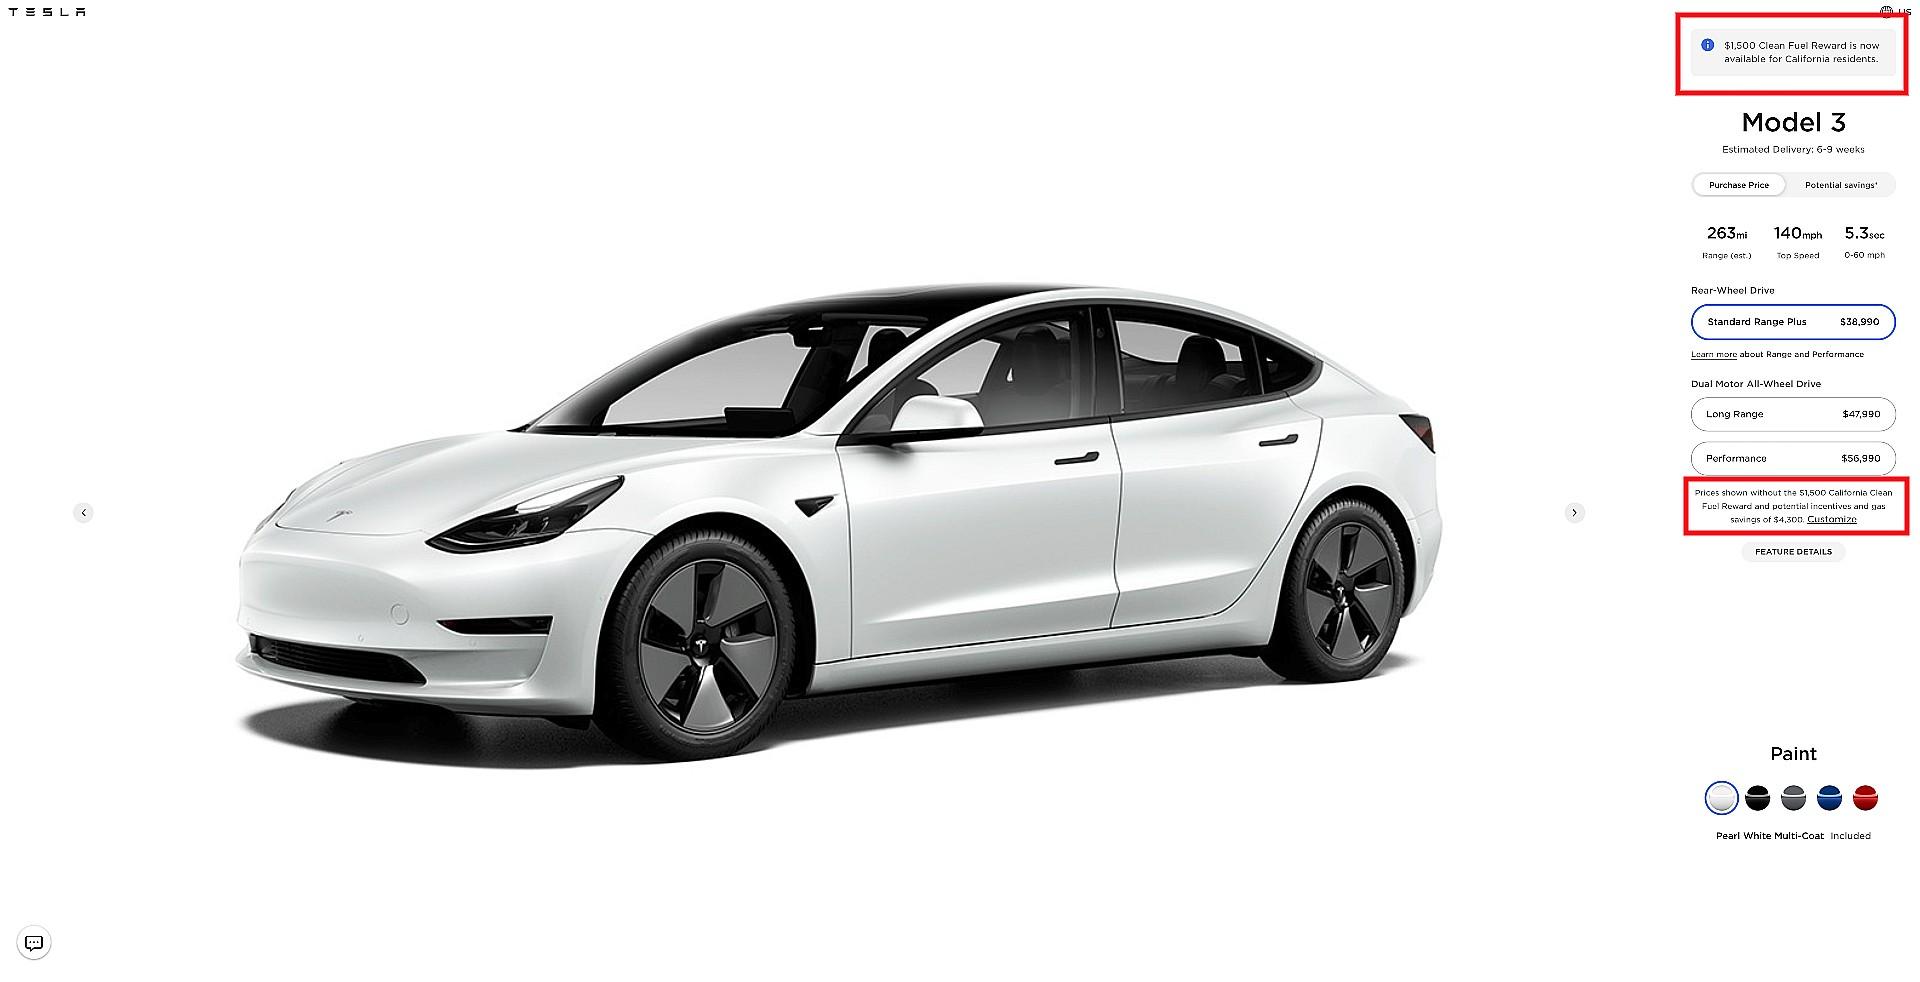 tesla-model-3-california-clean-fuel-reward